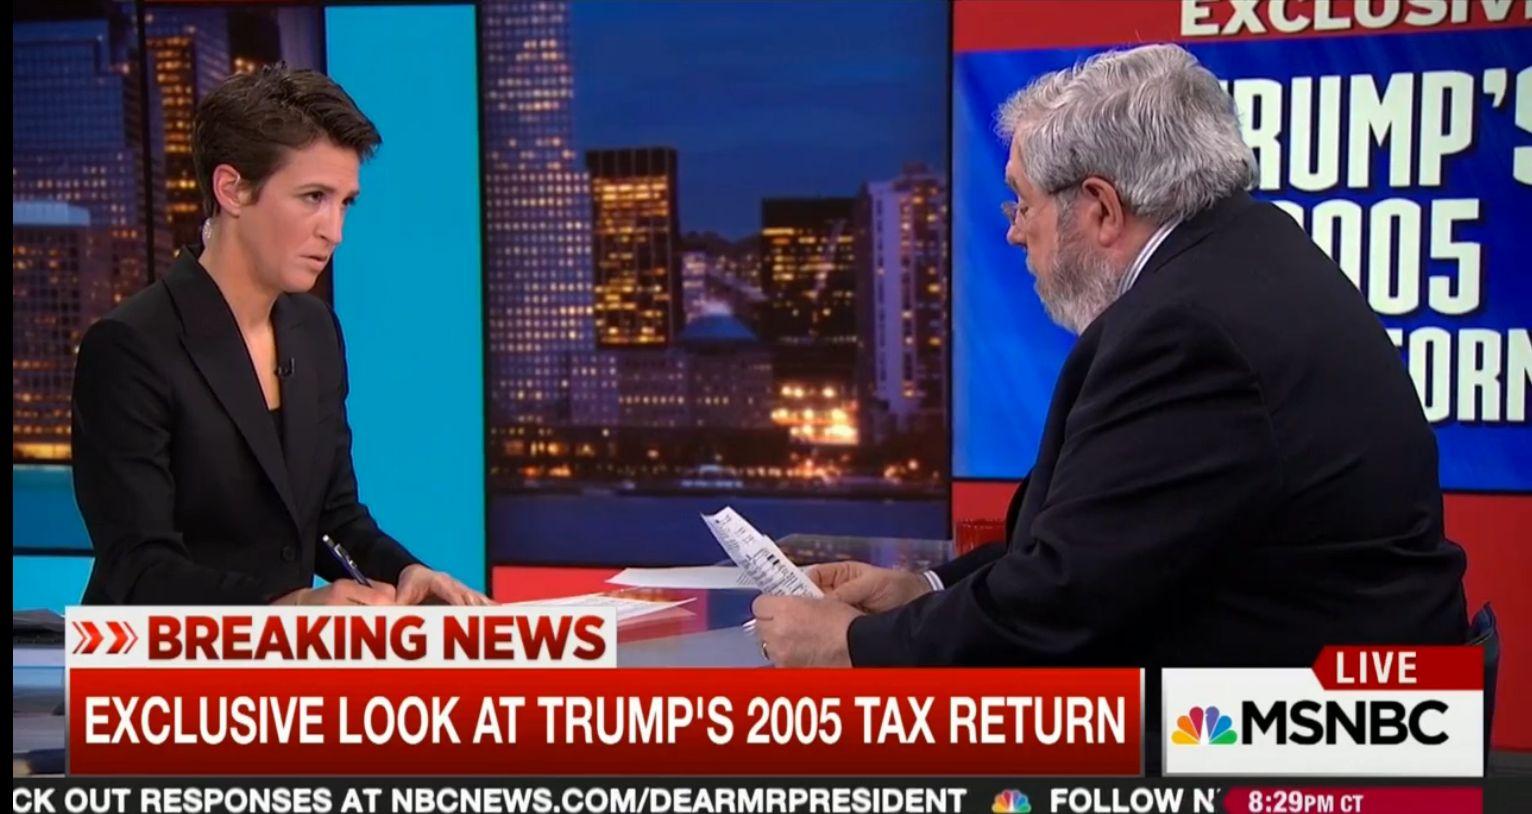 Journalist David Cay Johnston discussing Trumps 2005 tax return on The Rachel Maddow Show